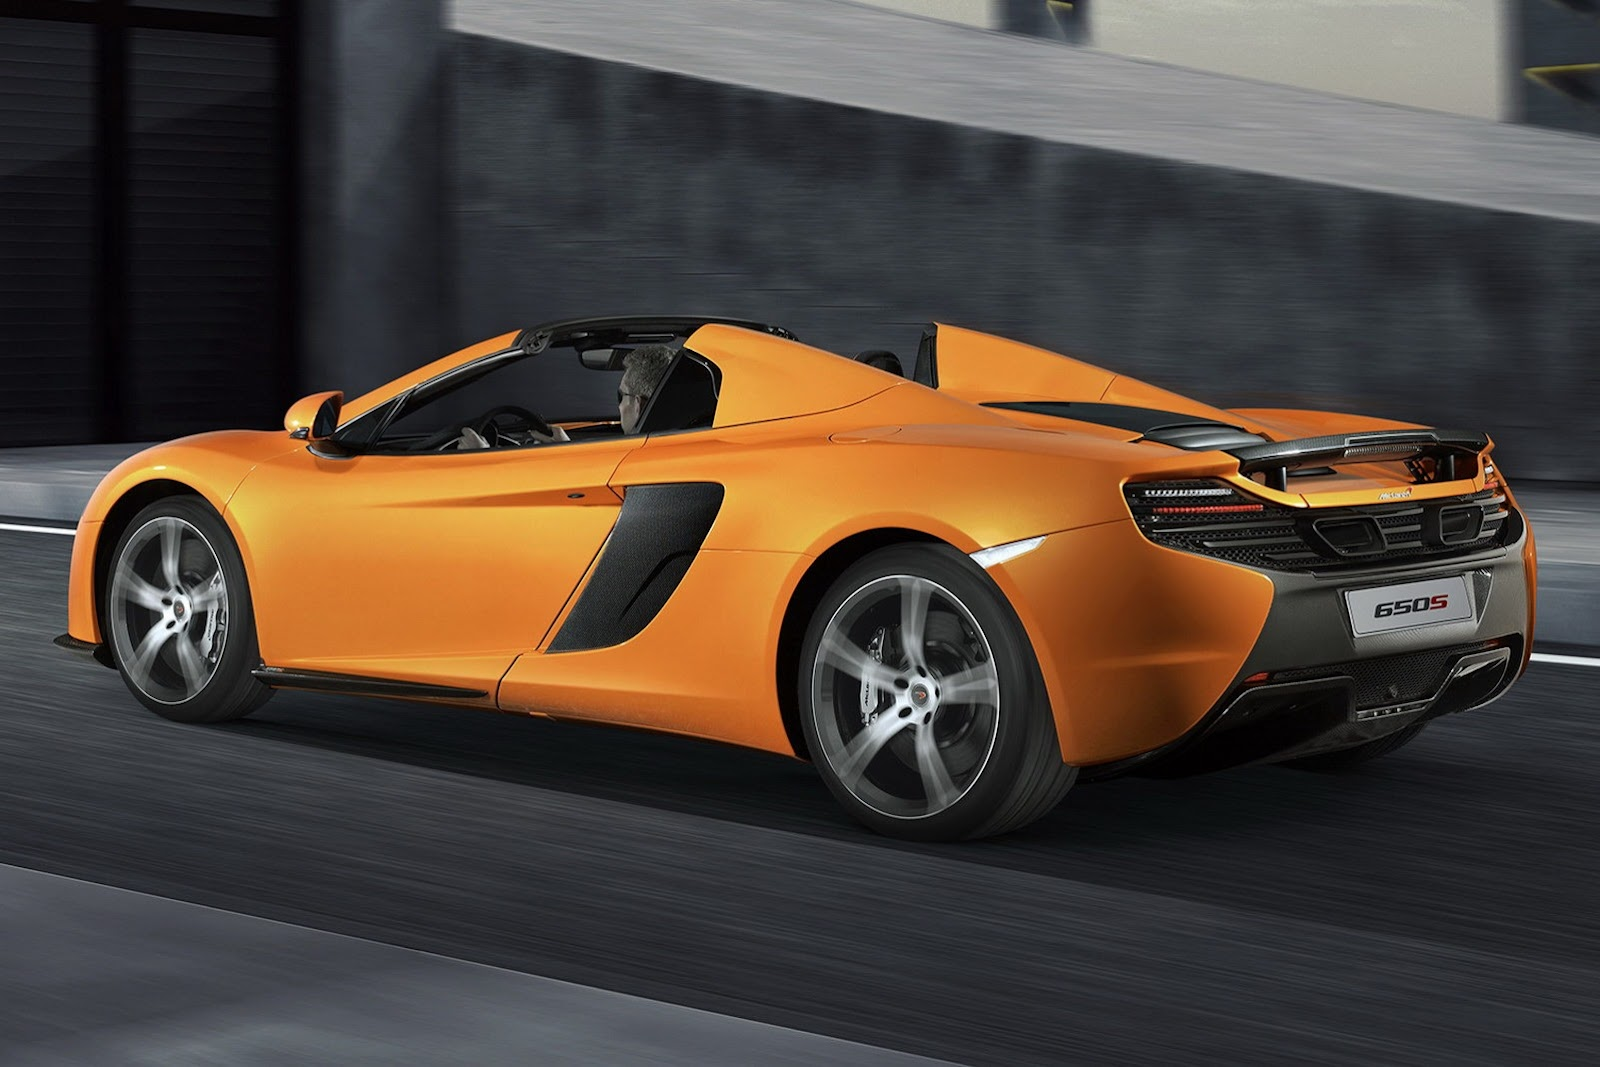 http://lh4.ggpht.com/-7aWgKHqynfo/UxW_hSCdYjI/AAAAAAAQSus/XifyERlJD8Y/s1600/McLaren-65-S-10%25255B2%25255D.jpg